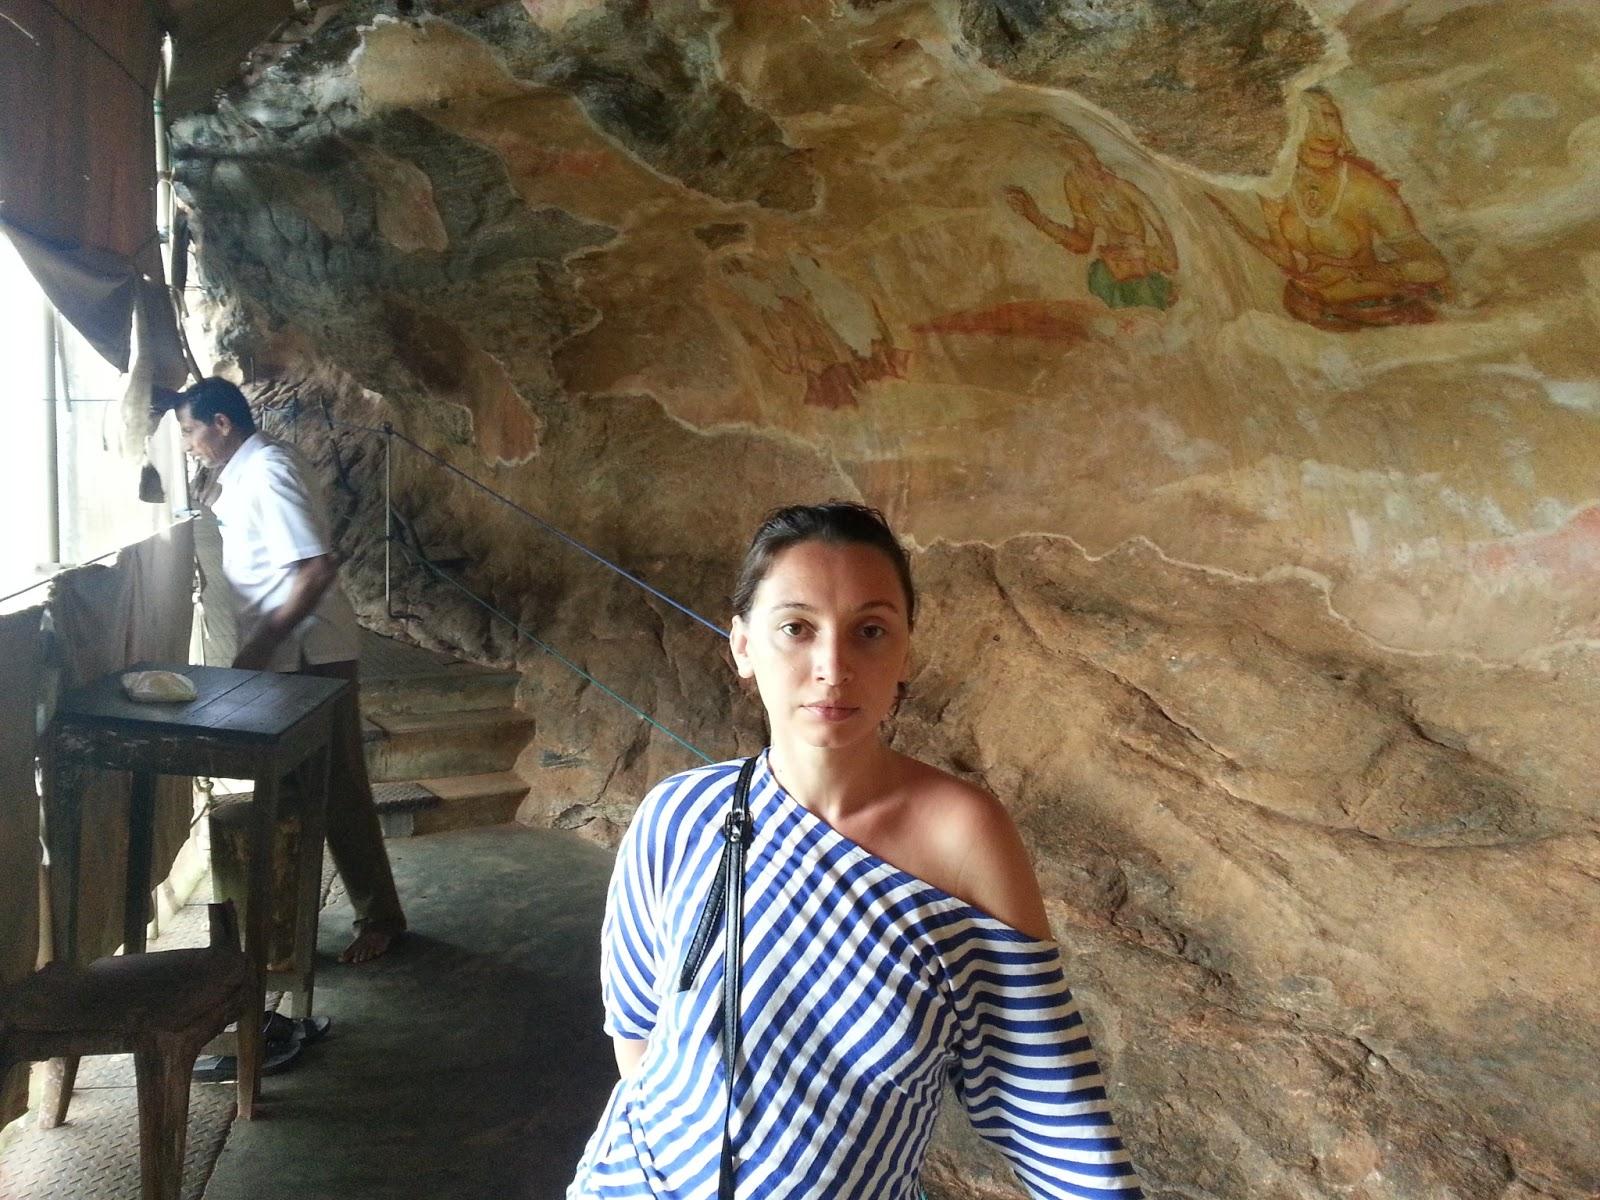 essay on sigiriya Contextual translation of essay about the trip to sigiriya into tamil human translations with examples: pen singam, clean india, ஒரு கட்டுரை பற்றி, மழை .